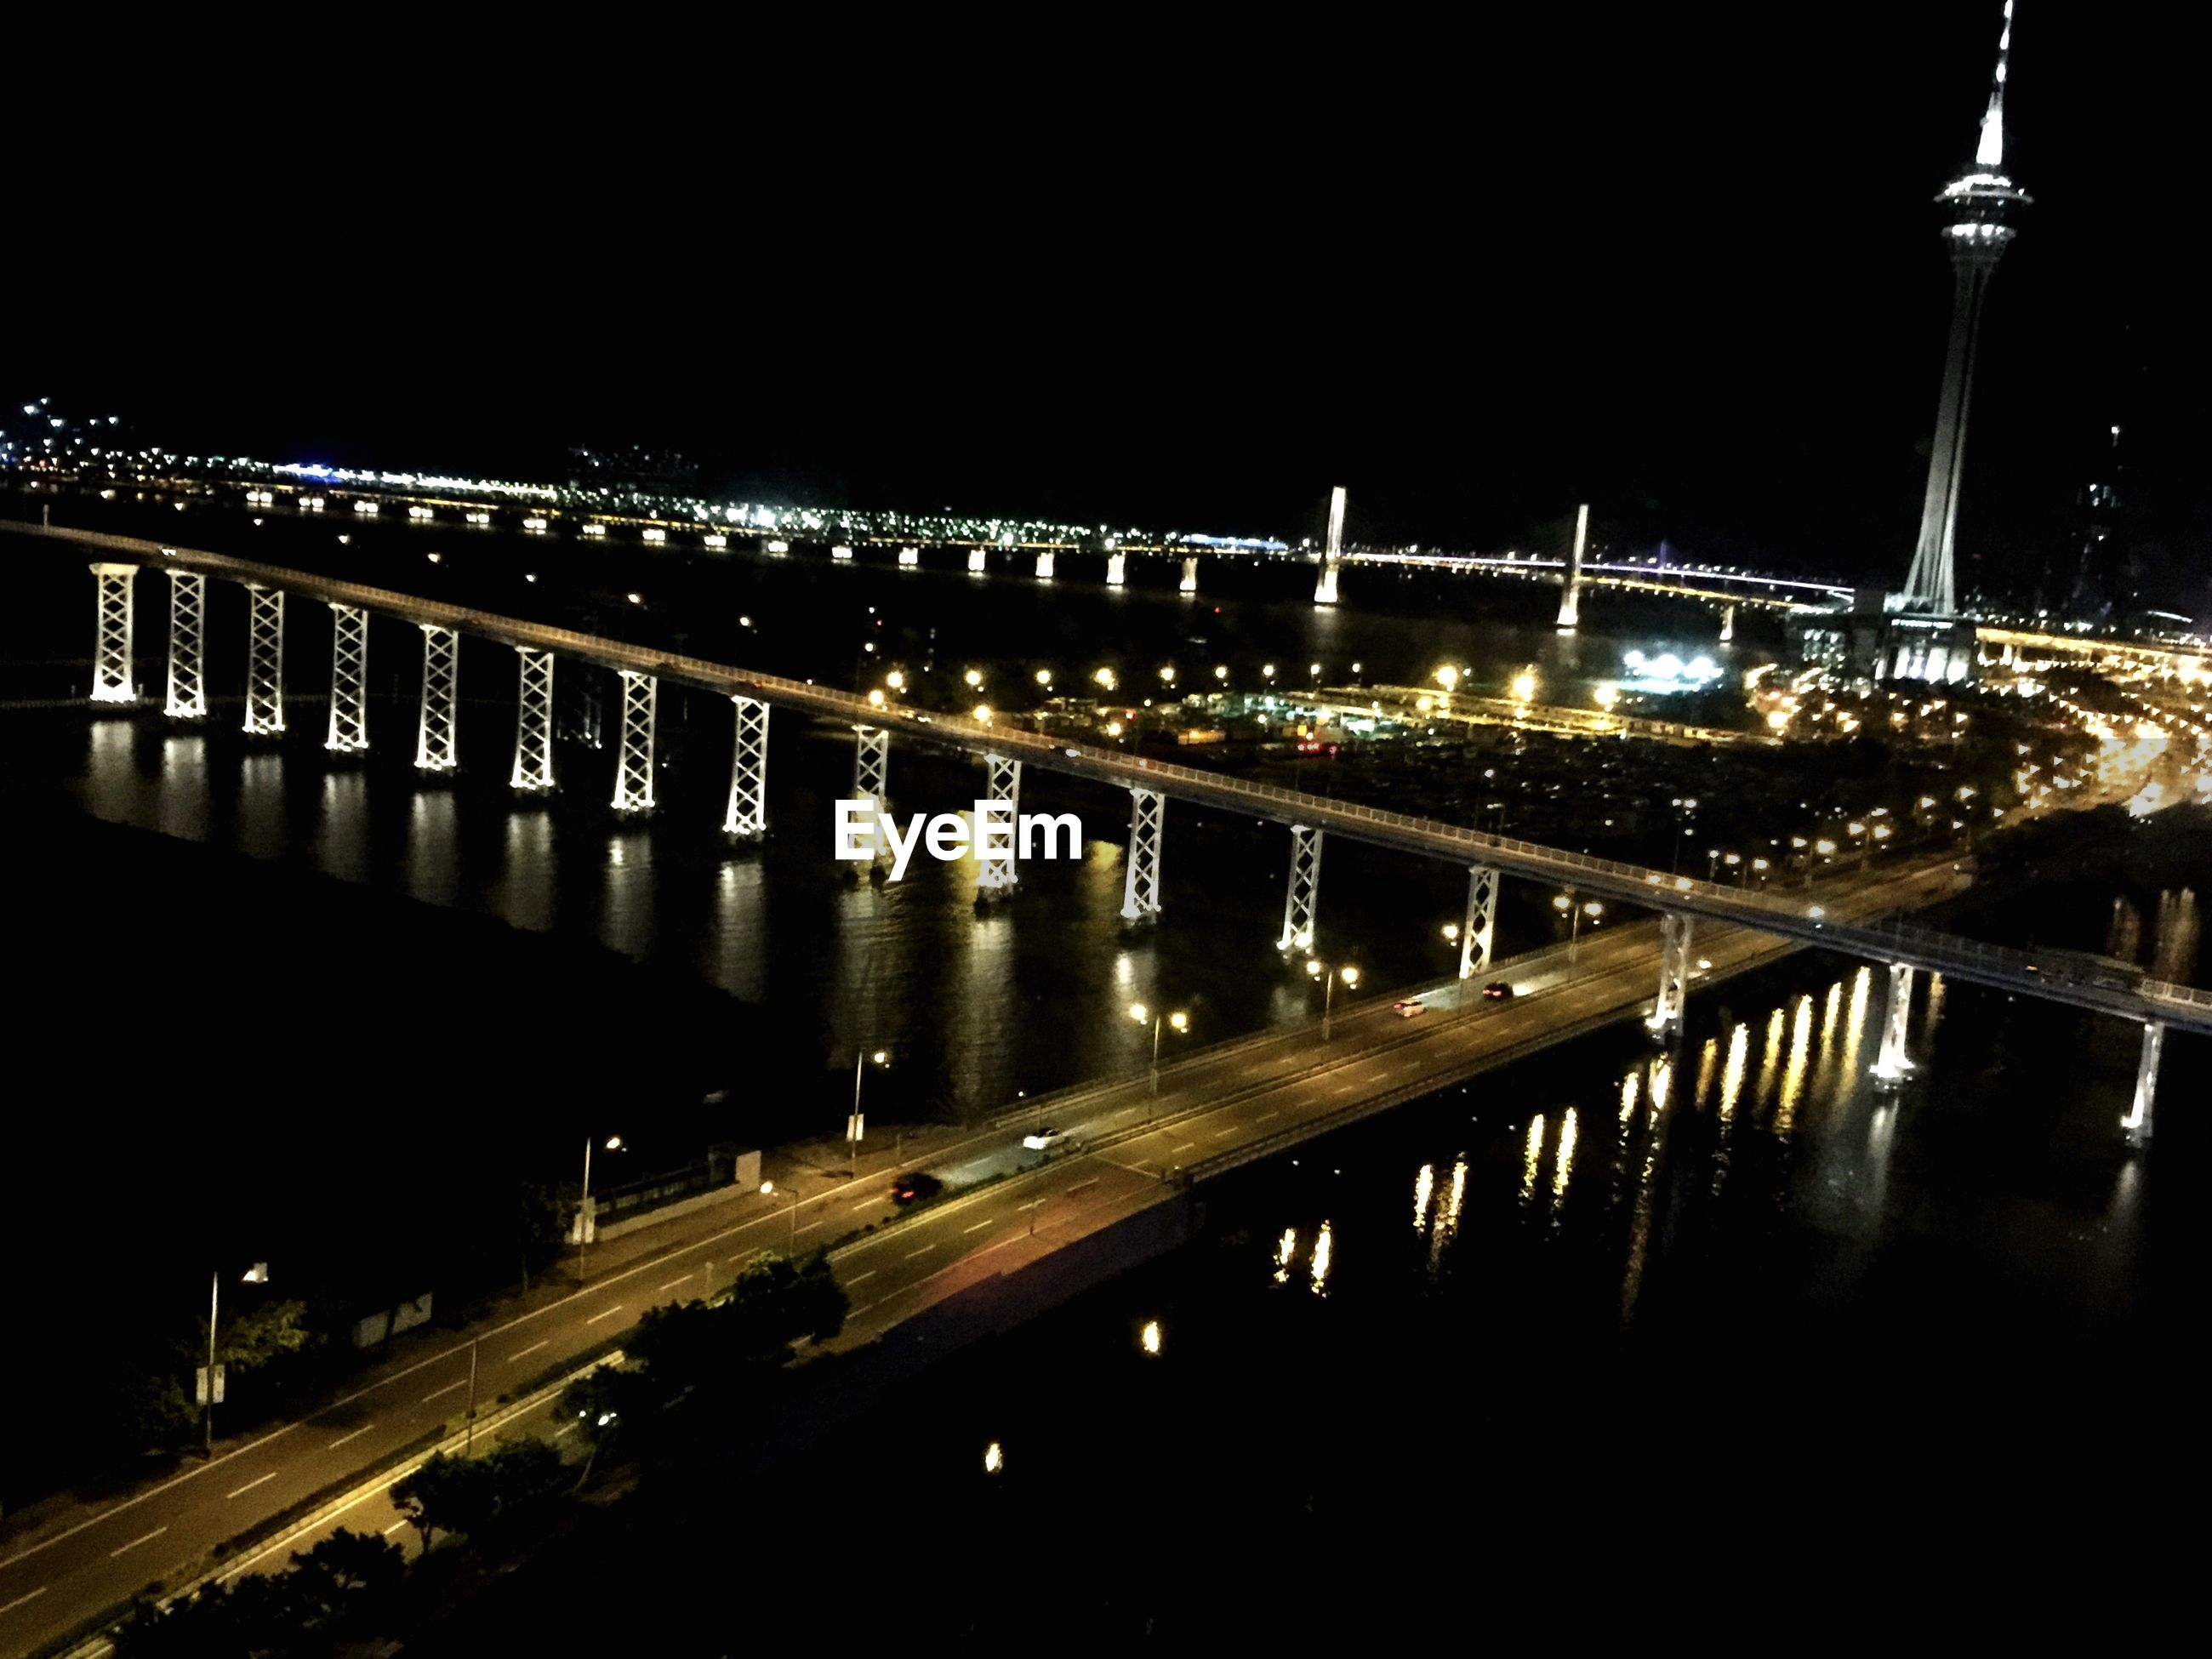 Illuminated macau tower against sky in city at night